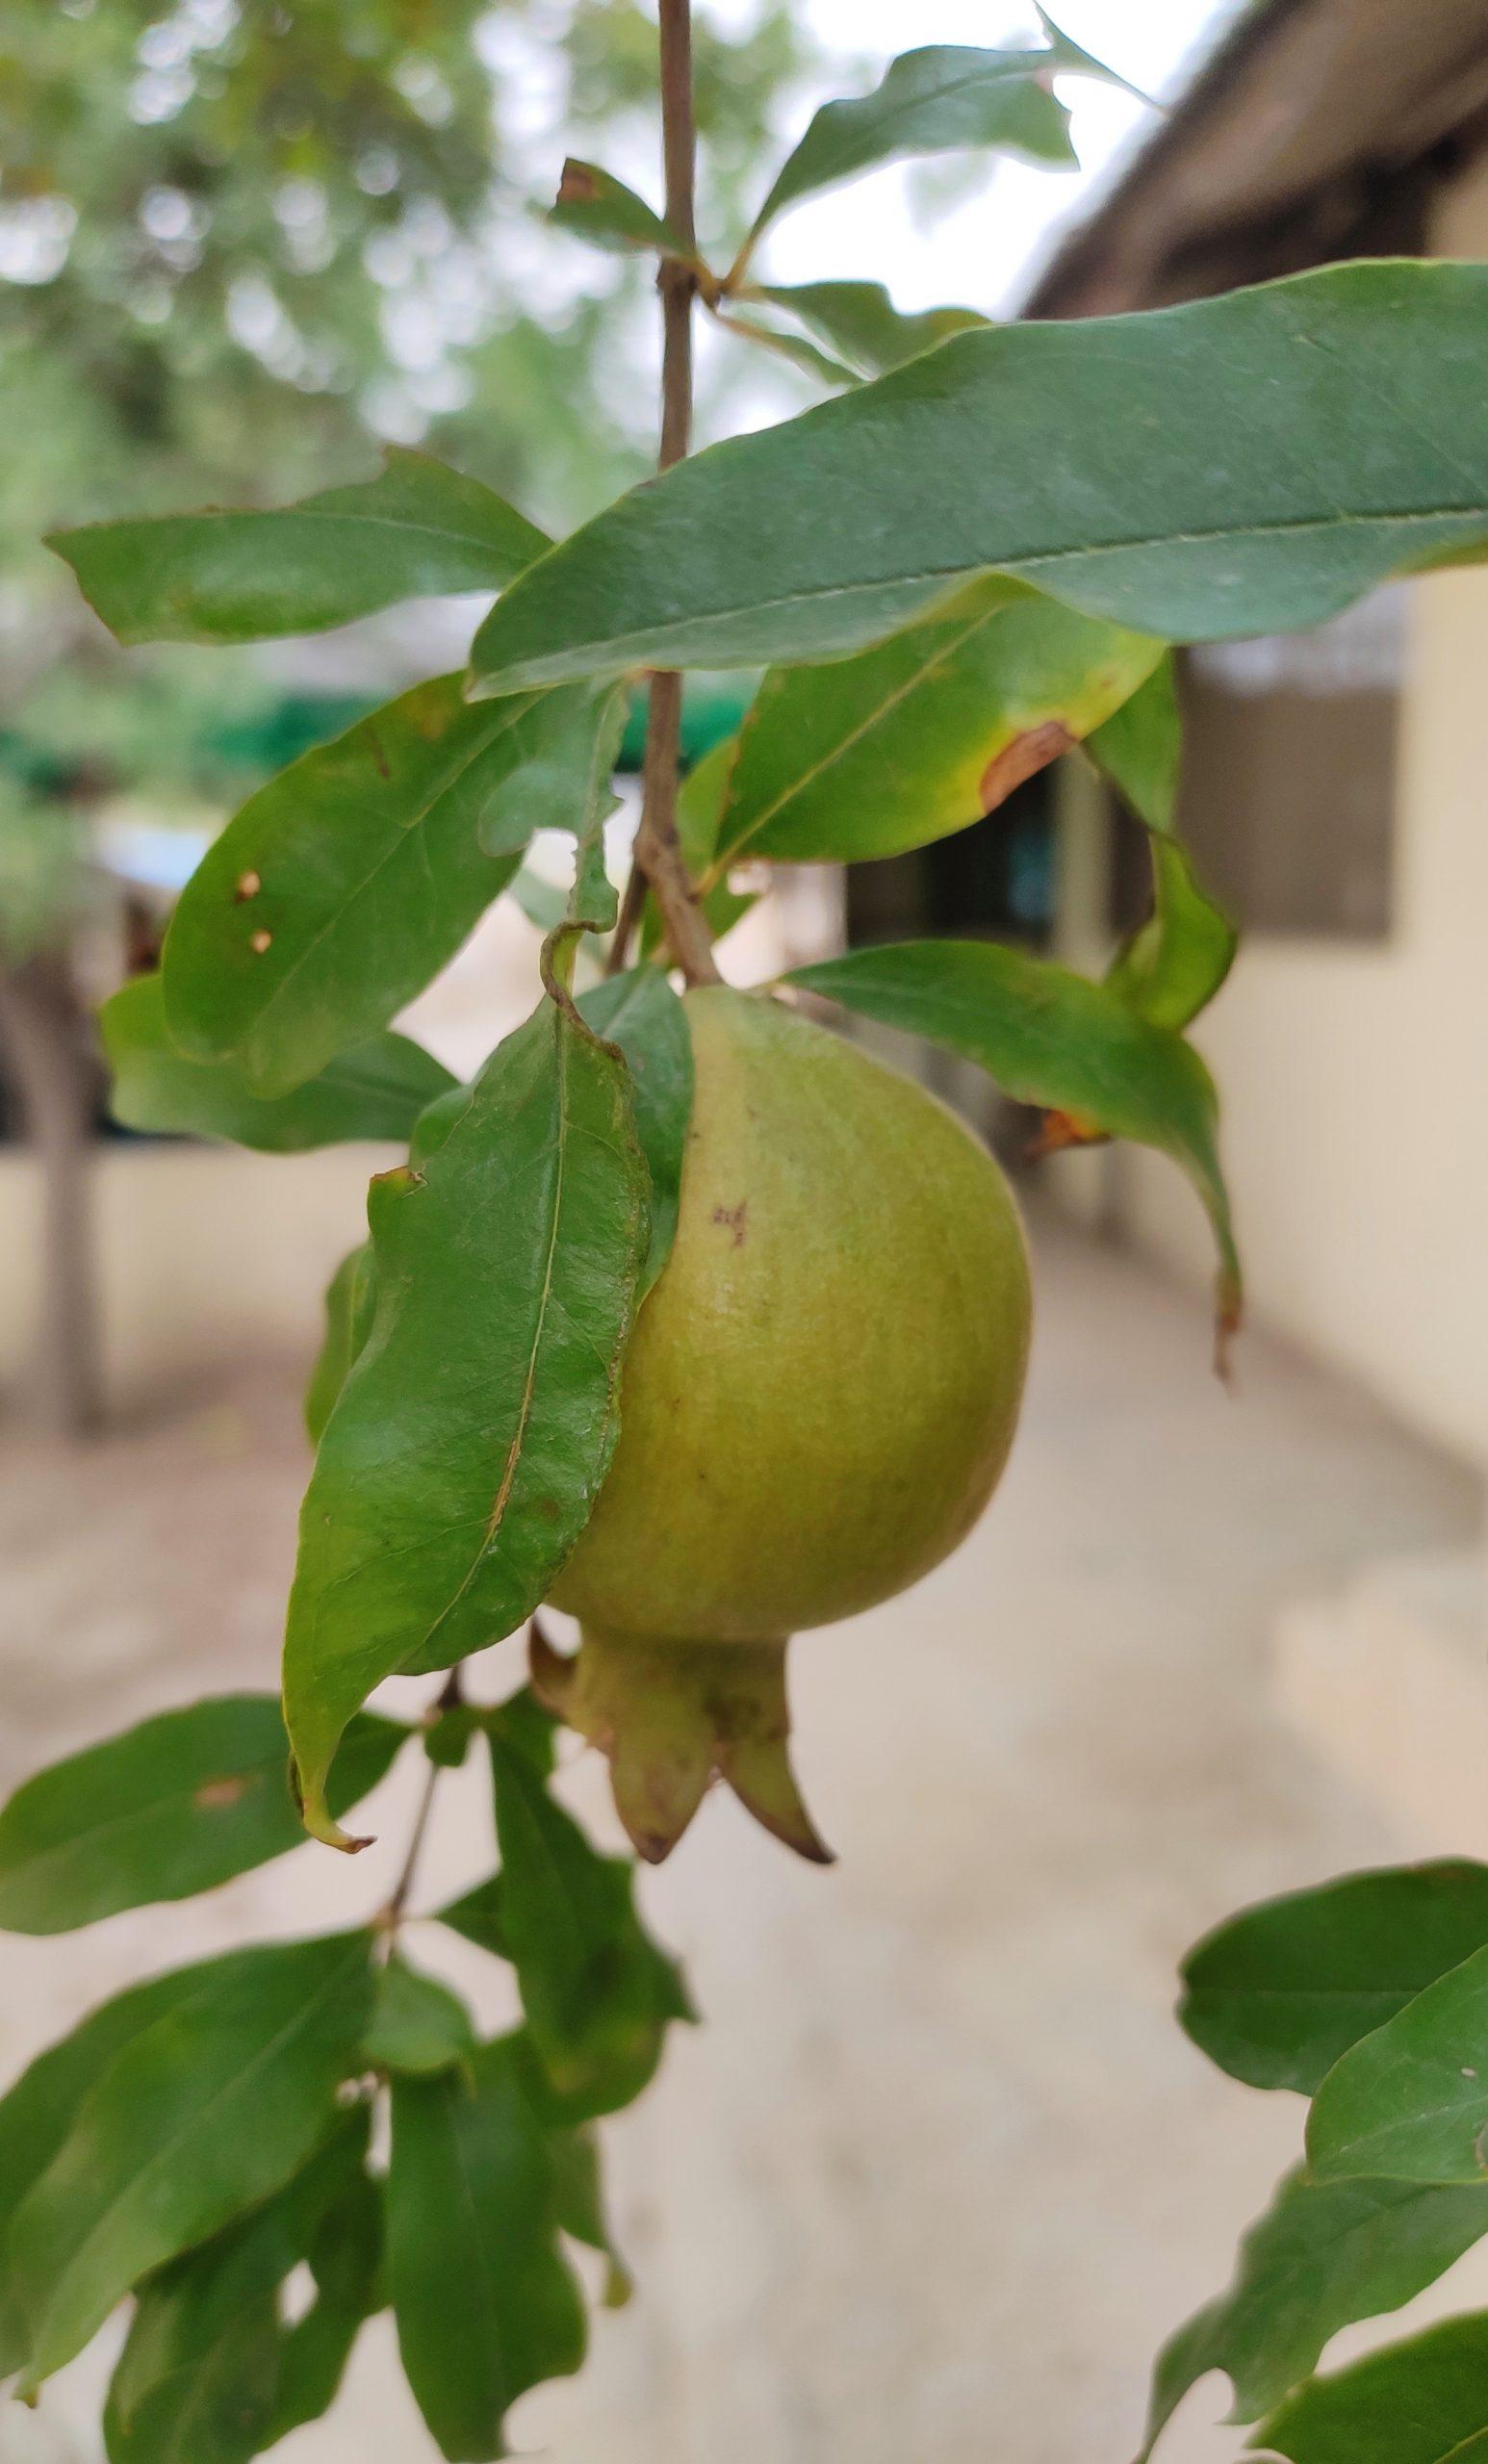 Pomegranate on its plant